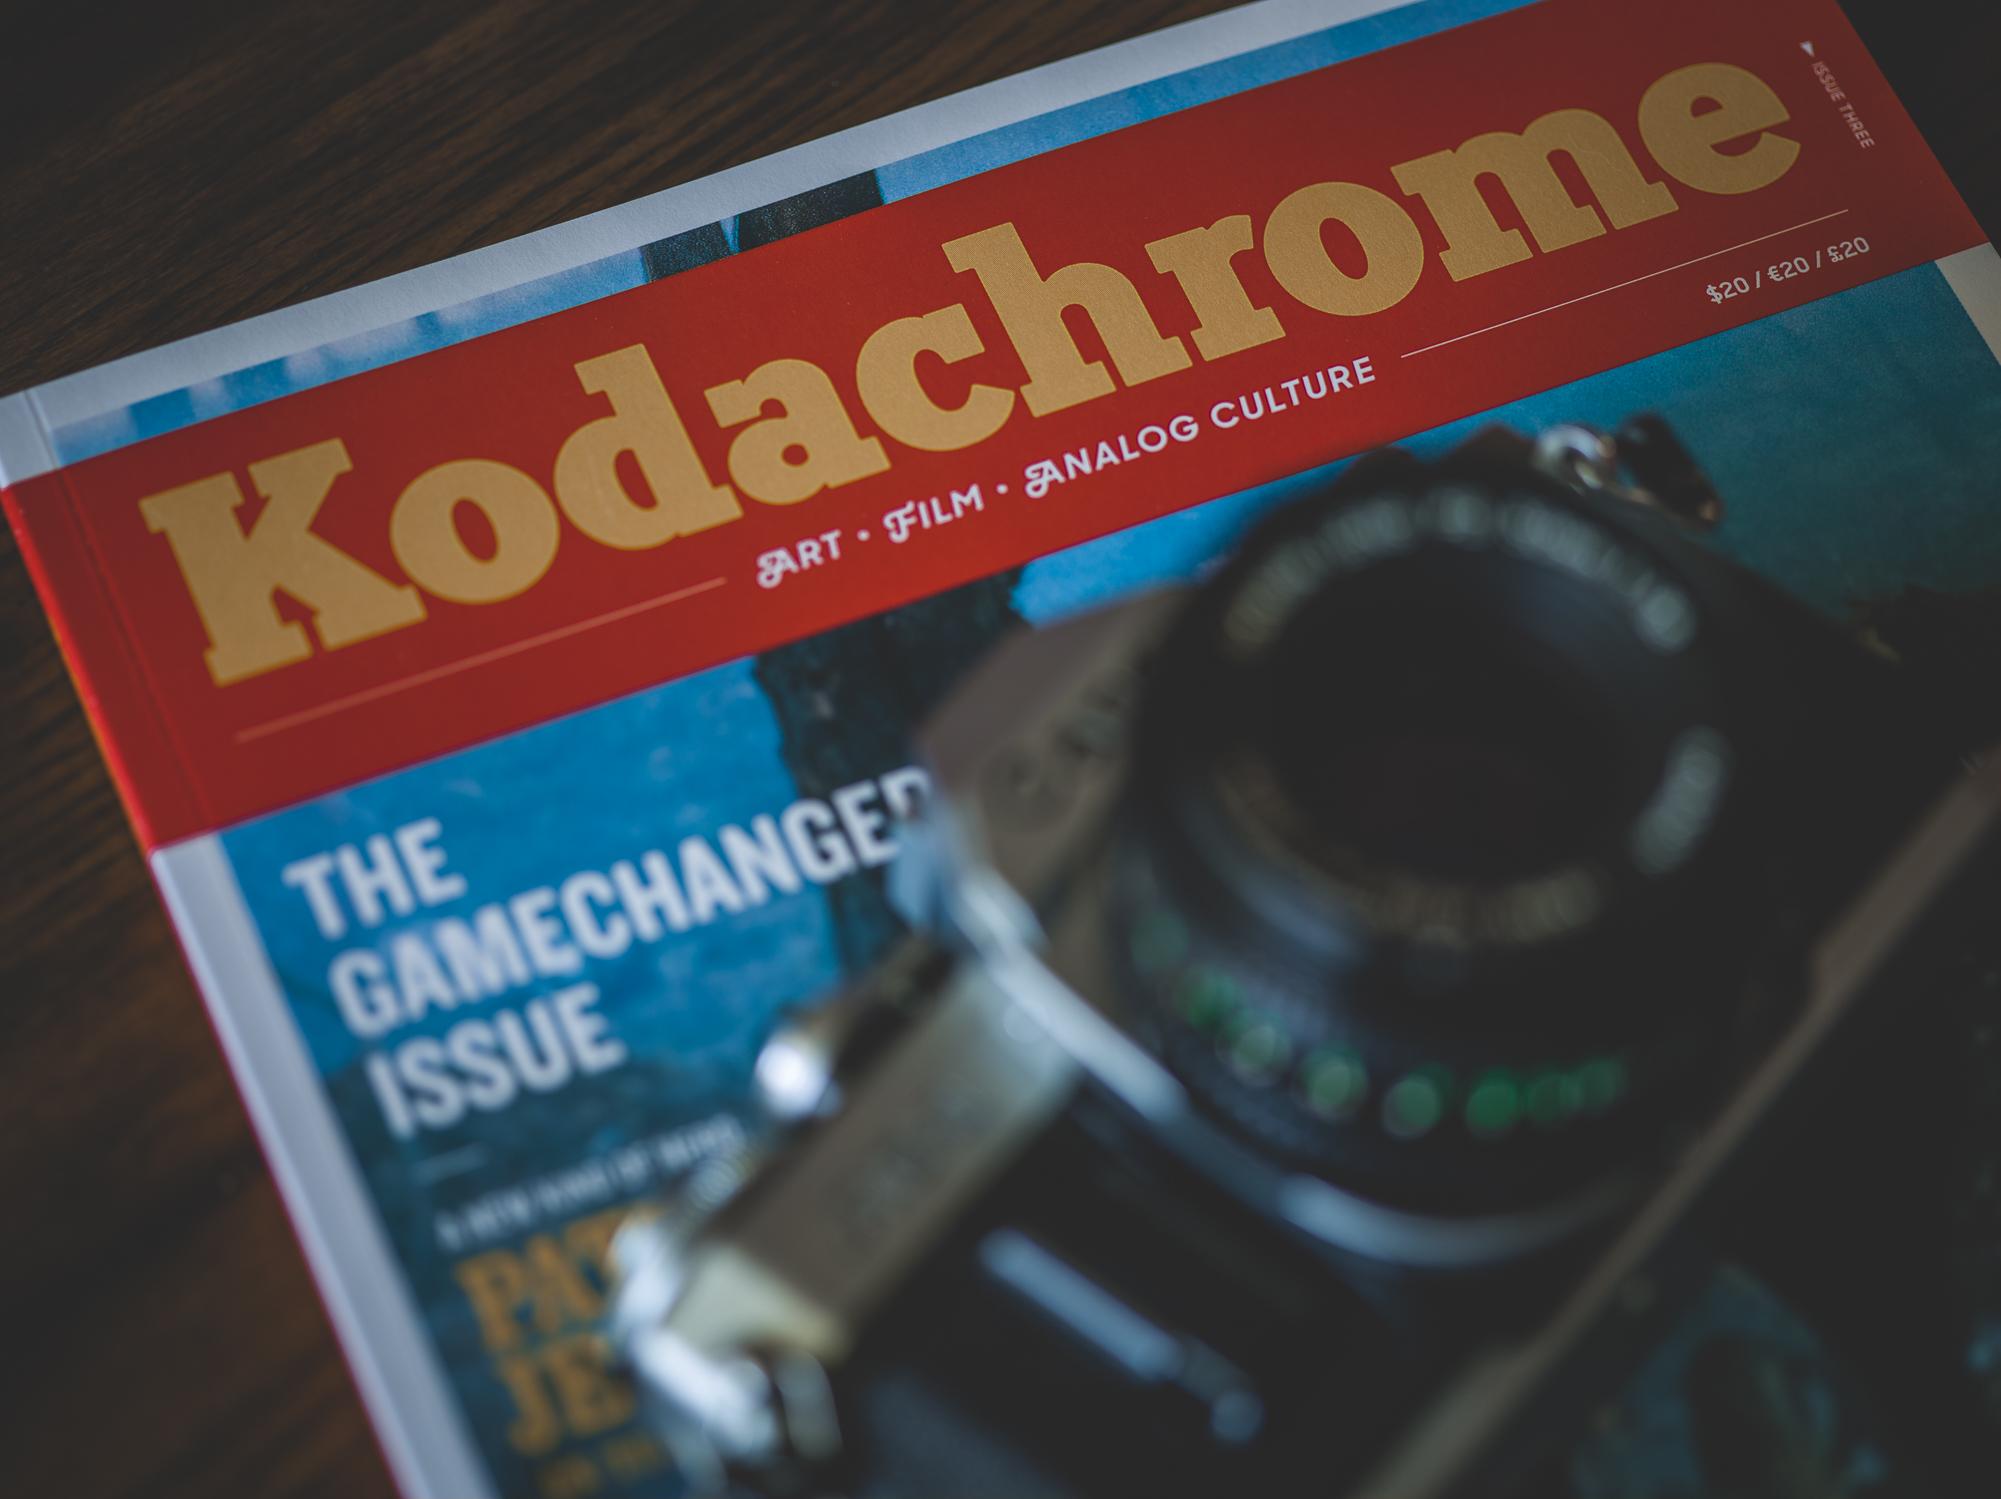 Issue 3 of 'Kodachrome'